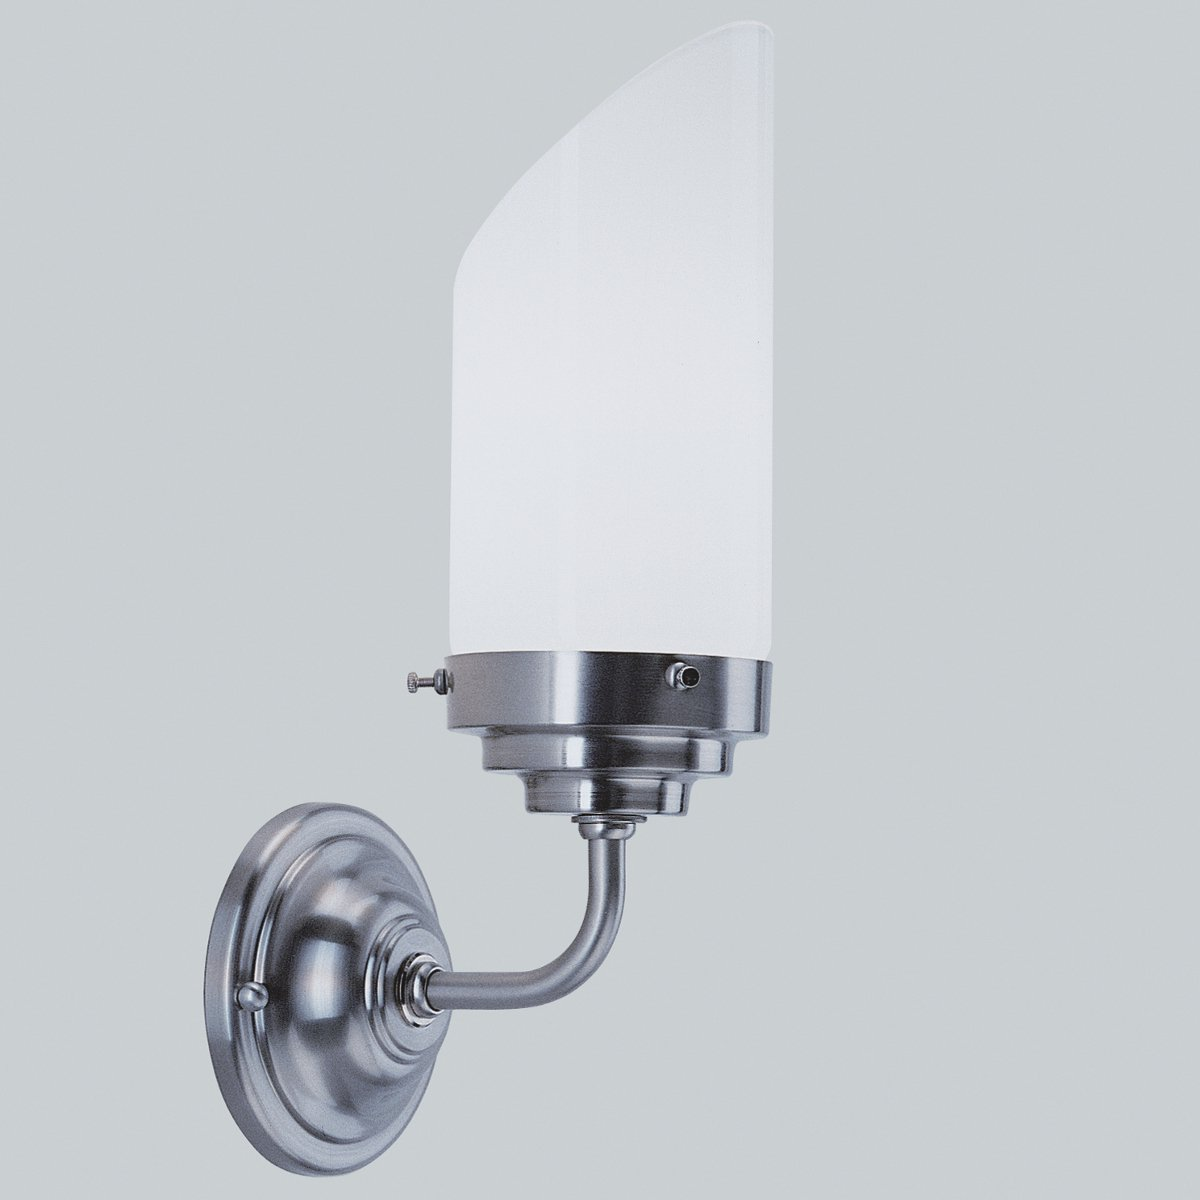 moderne wandleuchte im art deco stil als badlampe spiegellampe oder zur blendfreien beleuchtung. Black Bedroom Furniture Sets. Home Design Ideas